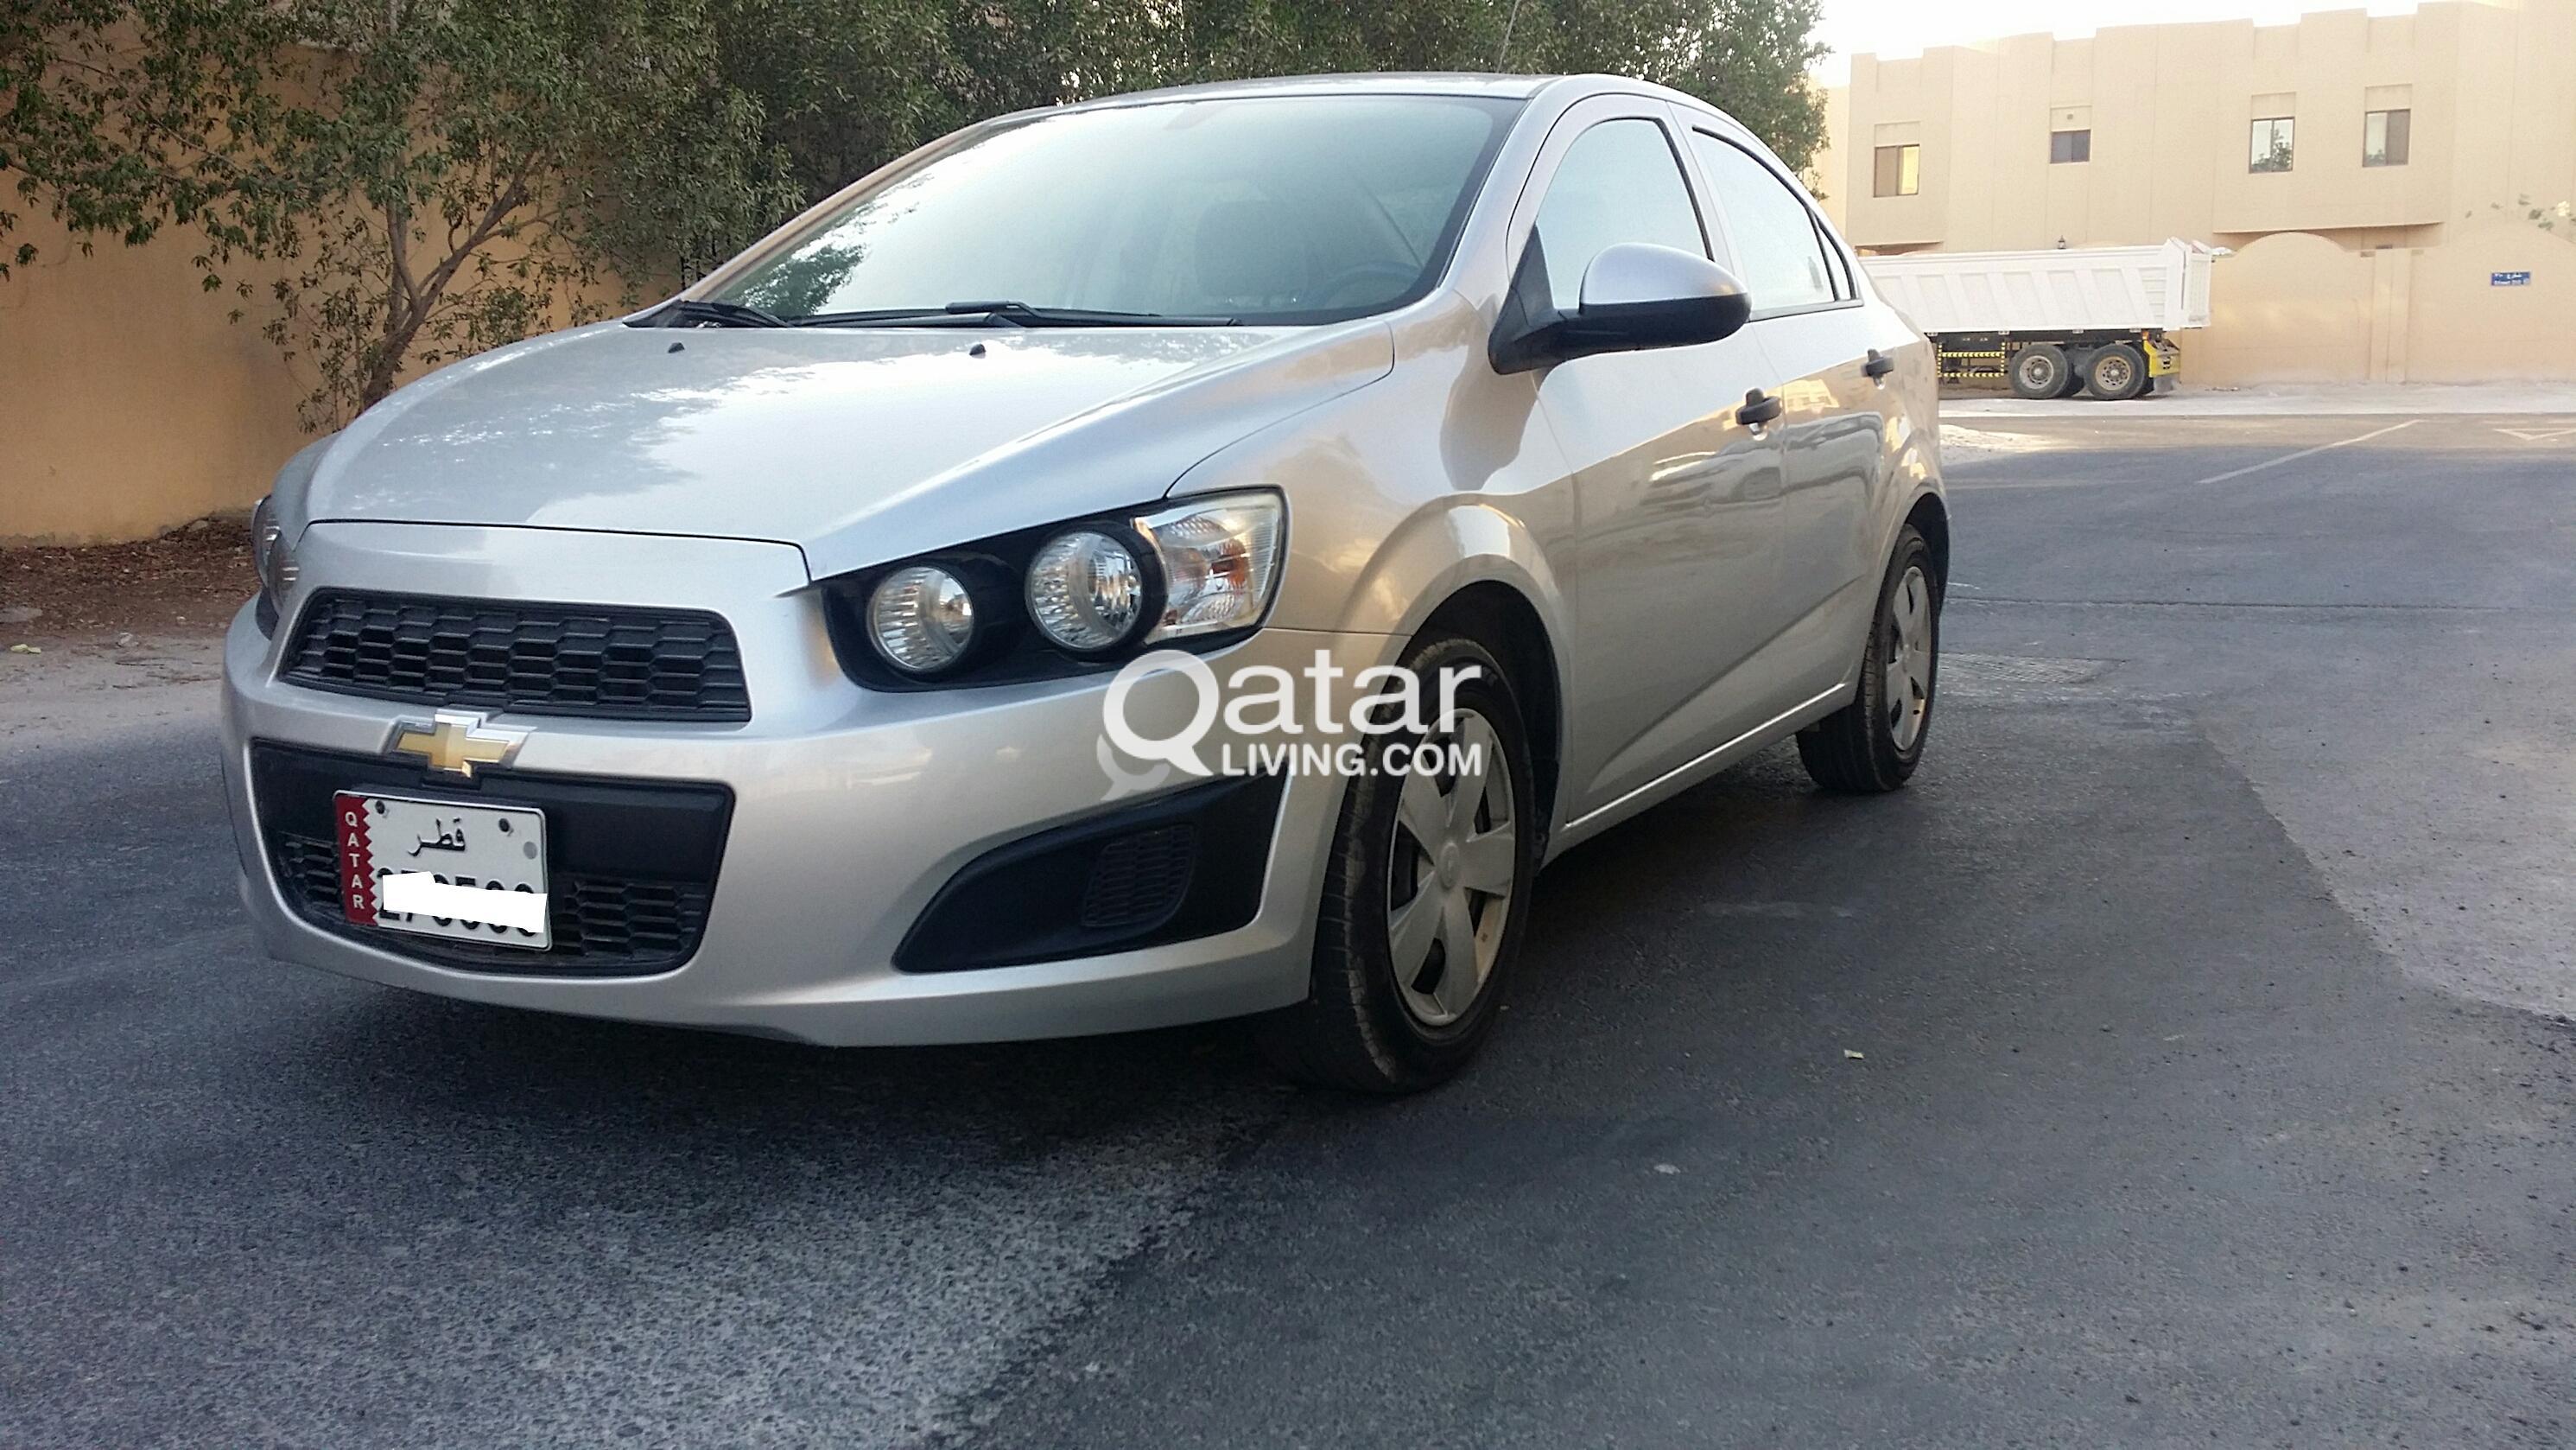 Sonic 2015 Perfect Price Chevrollet Qatar Living